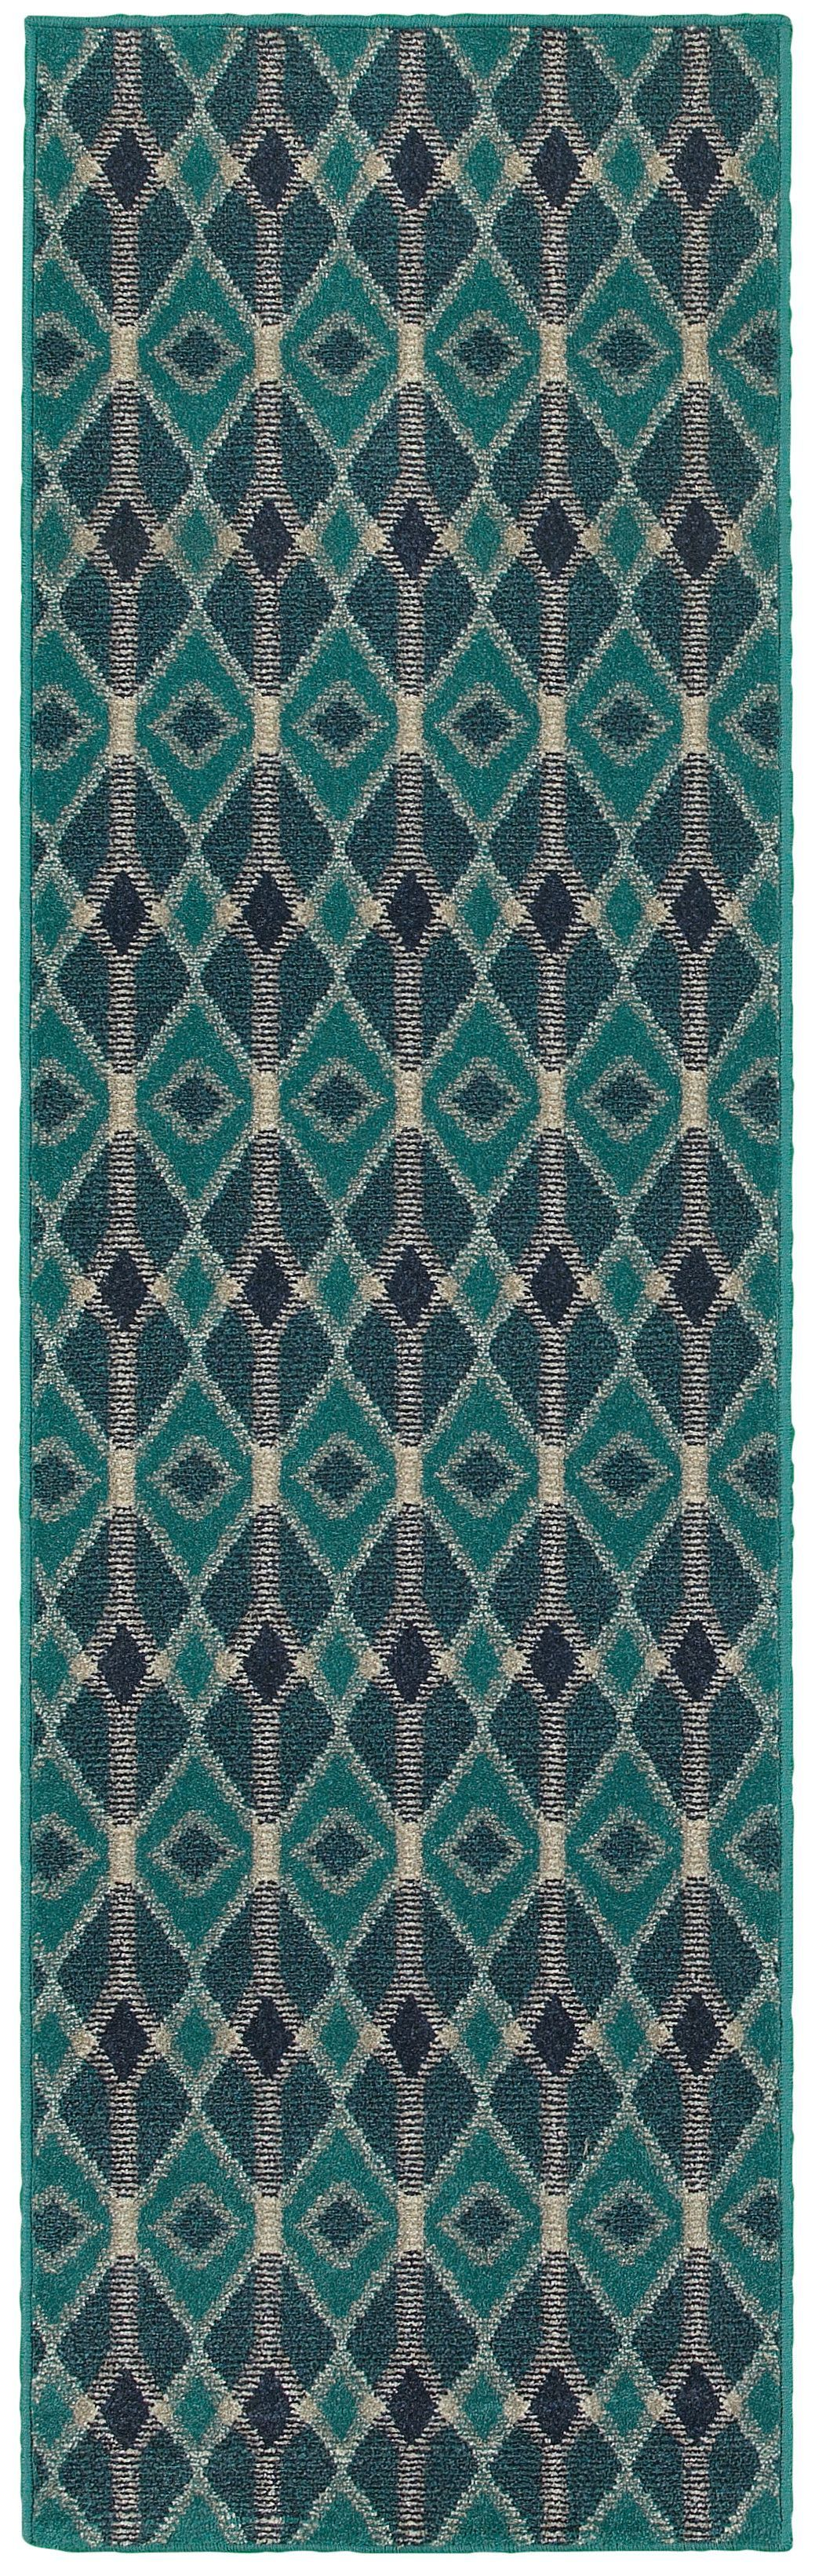 Oriental Weavers Highlands 6627B Blue/Teal Geometric Area Rug